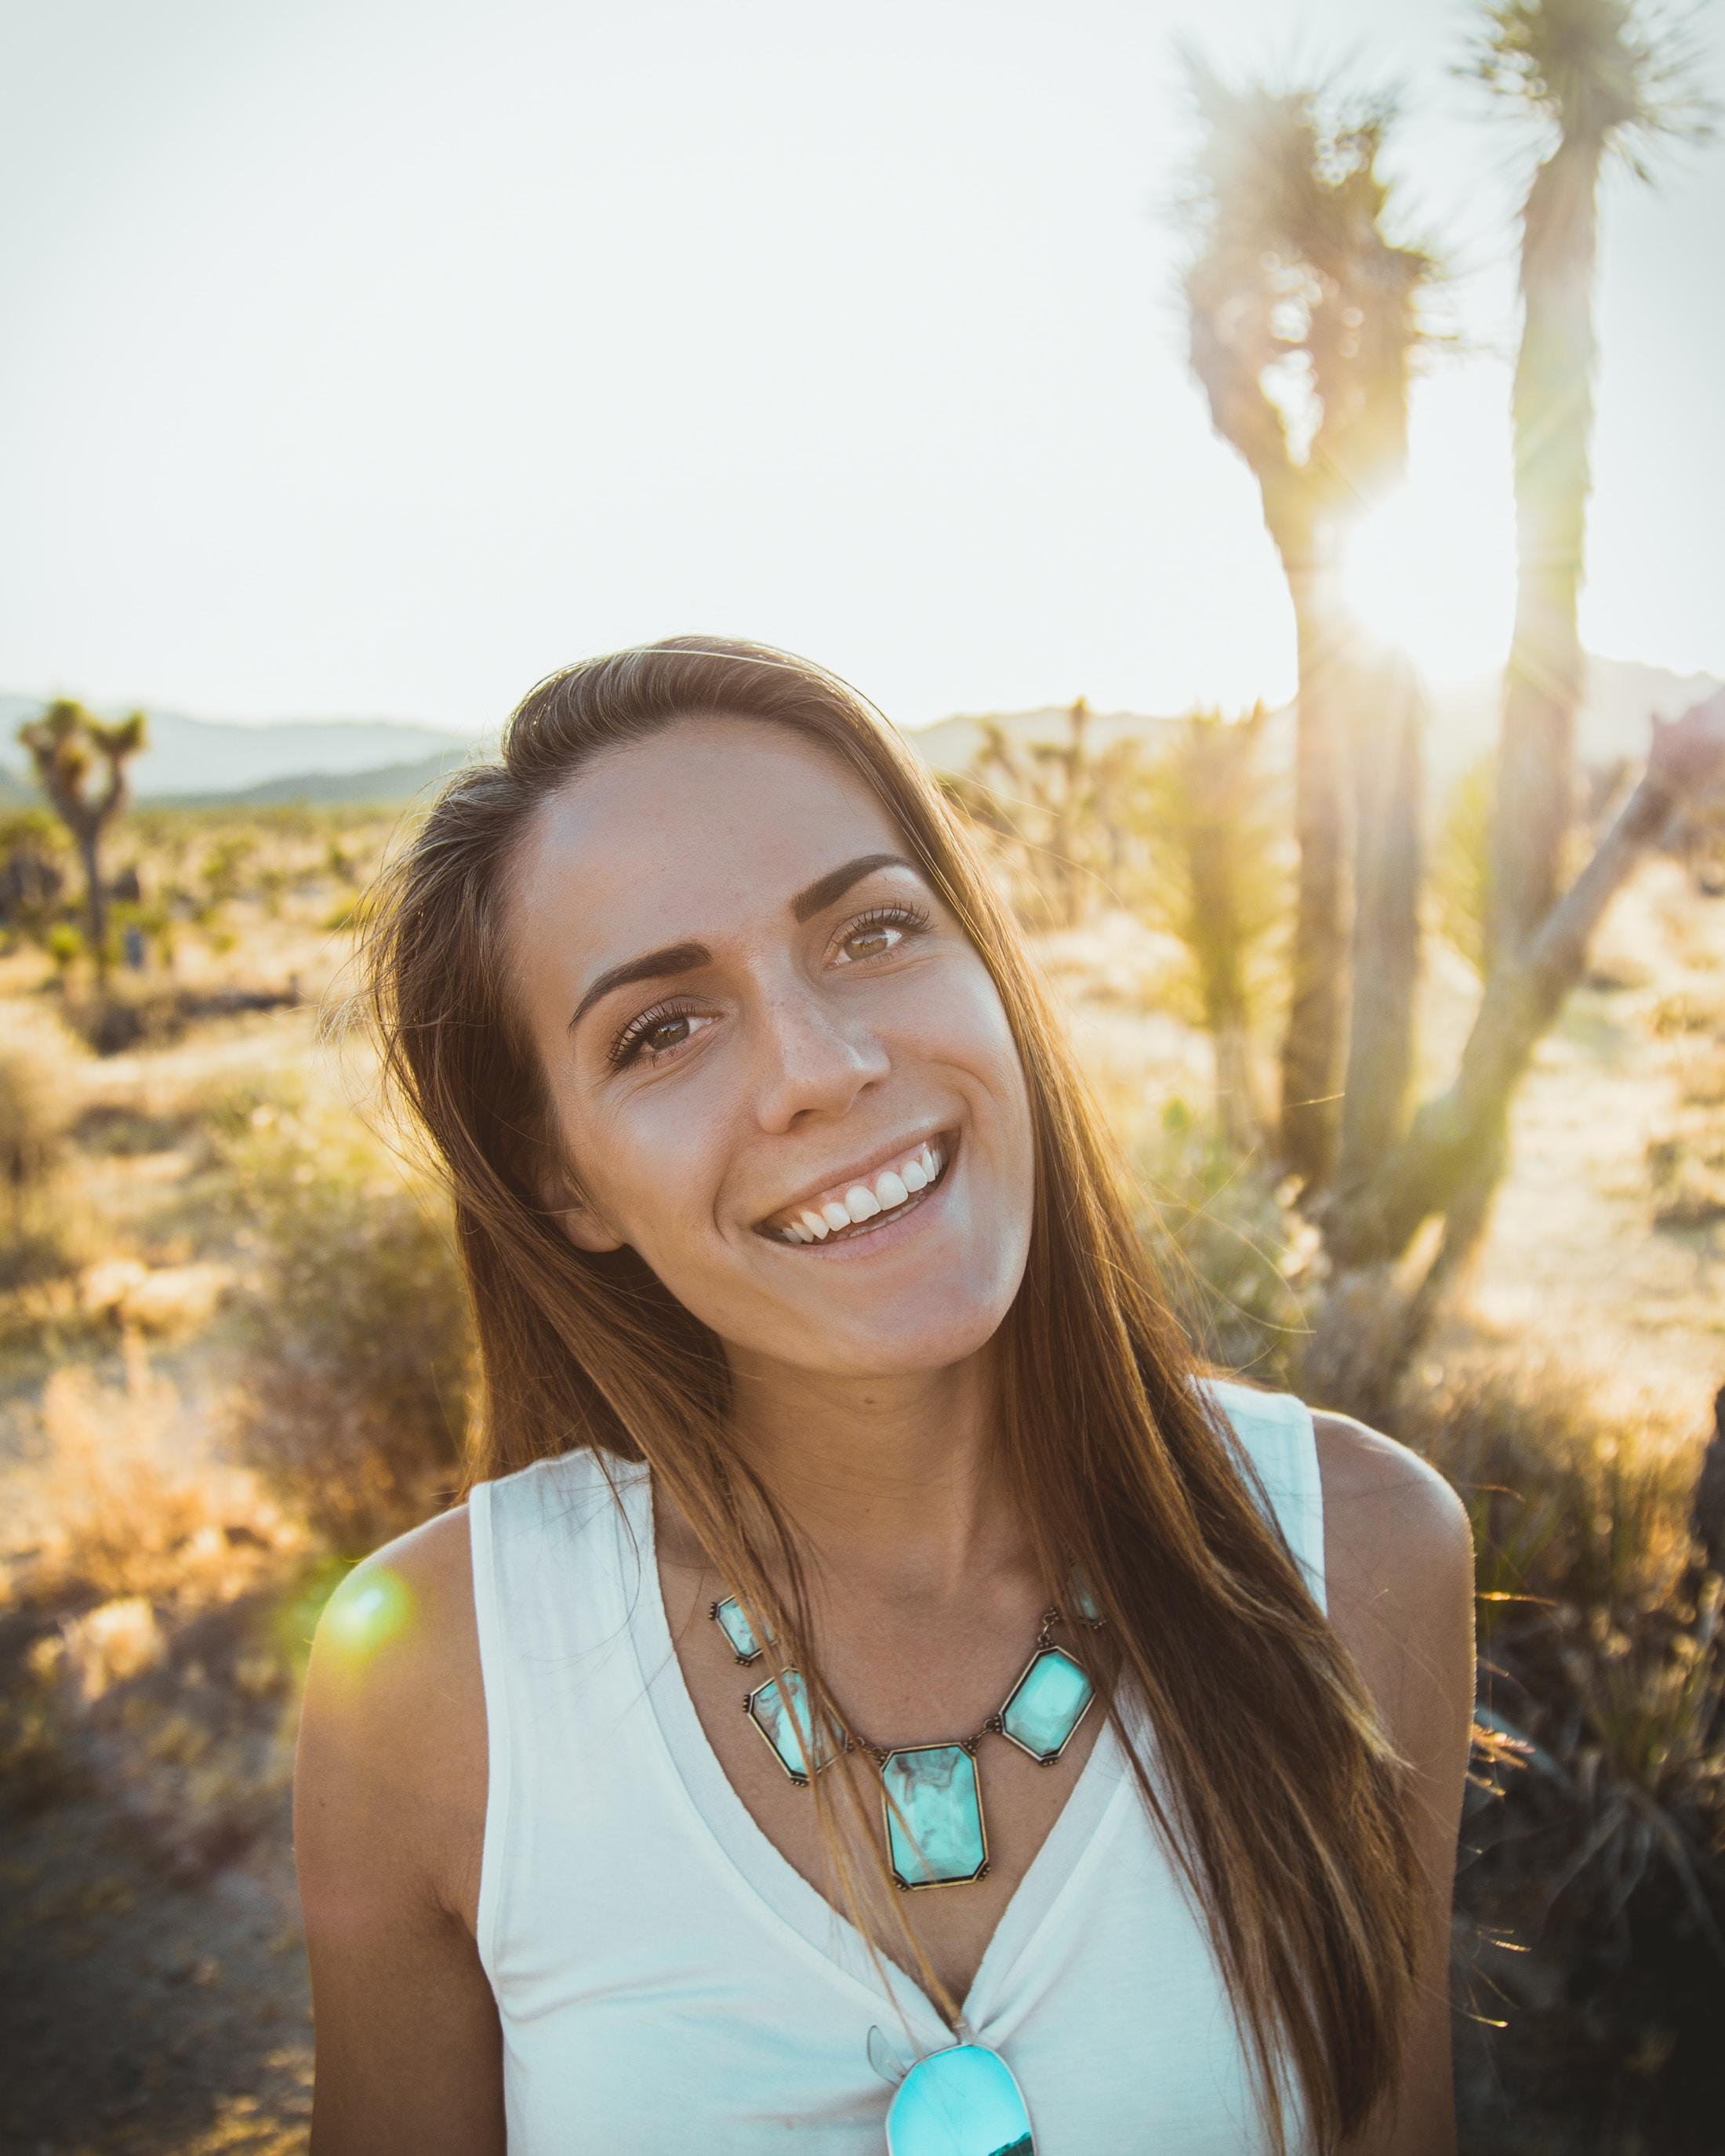 smiling woman near tree